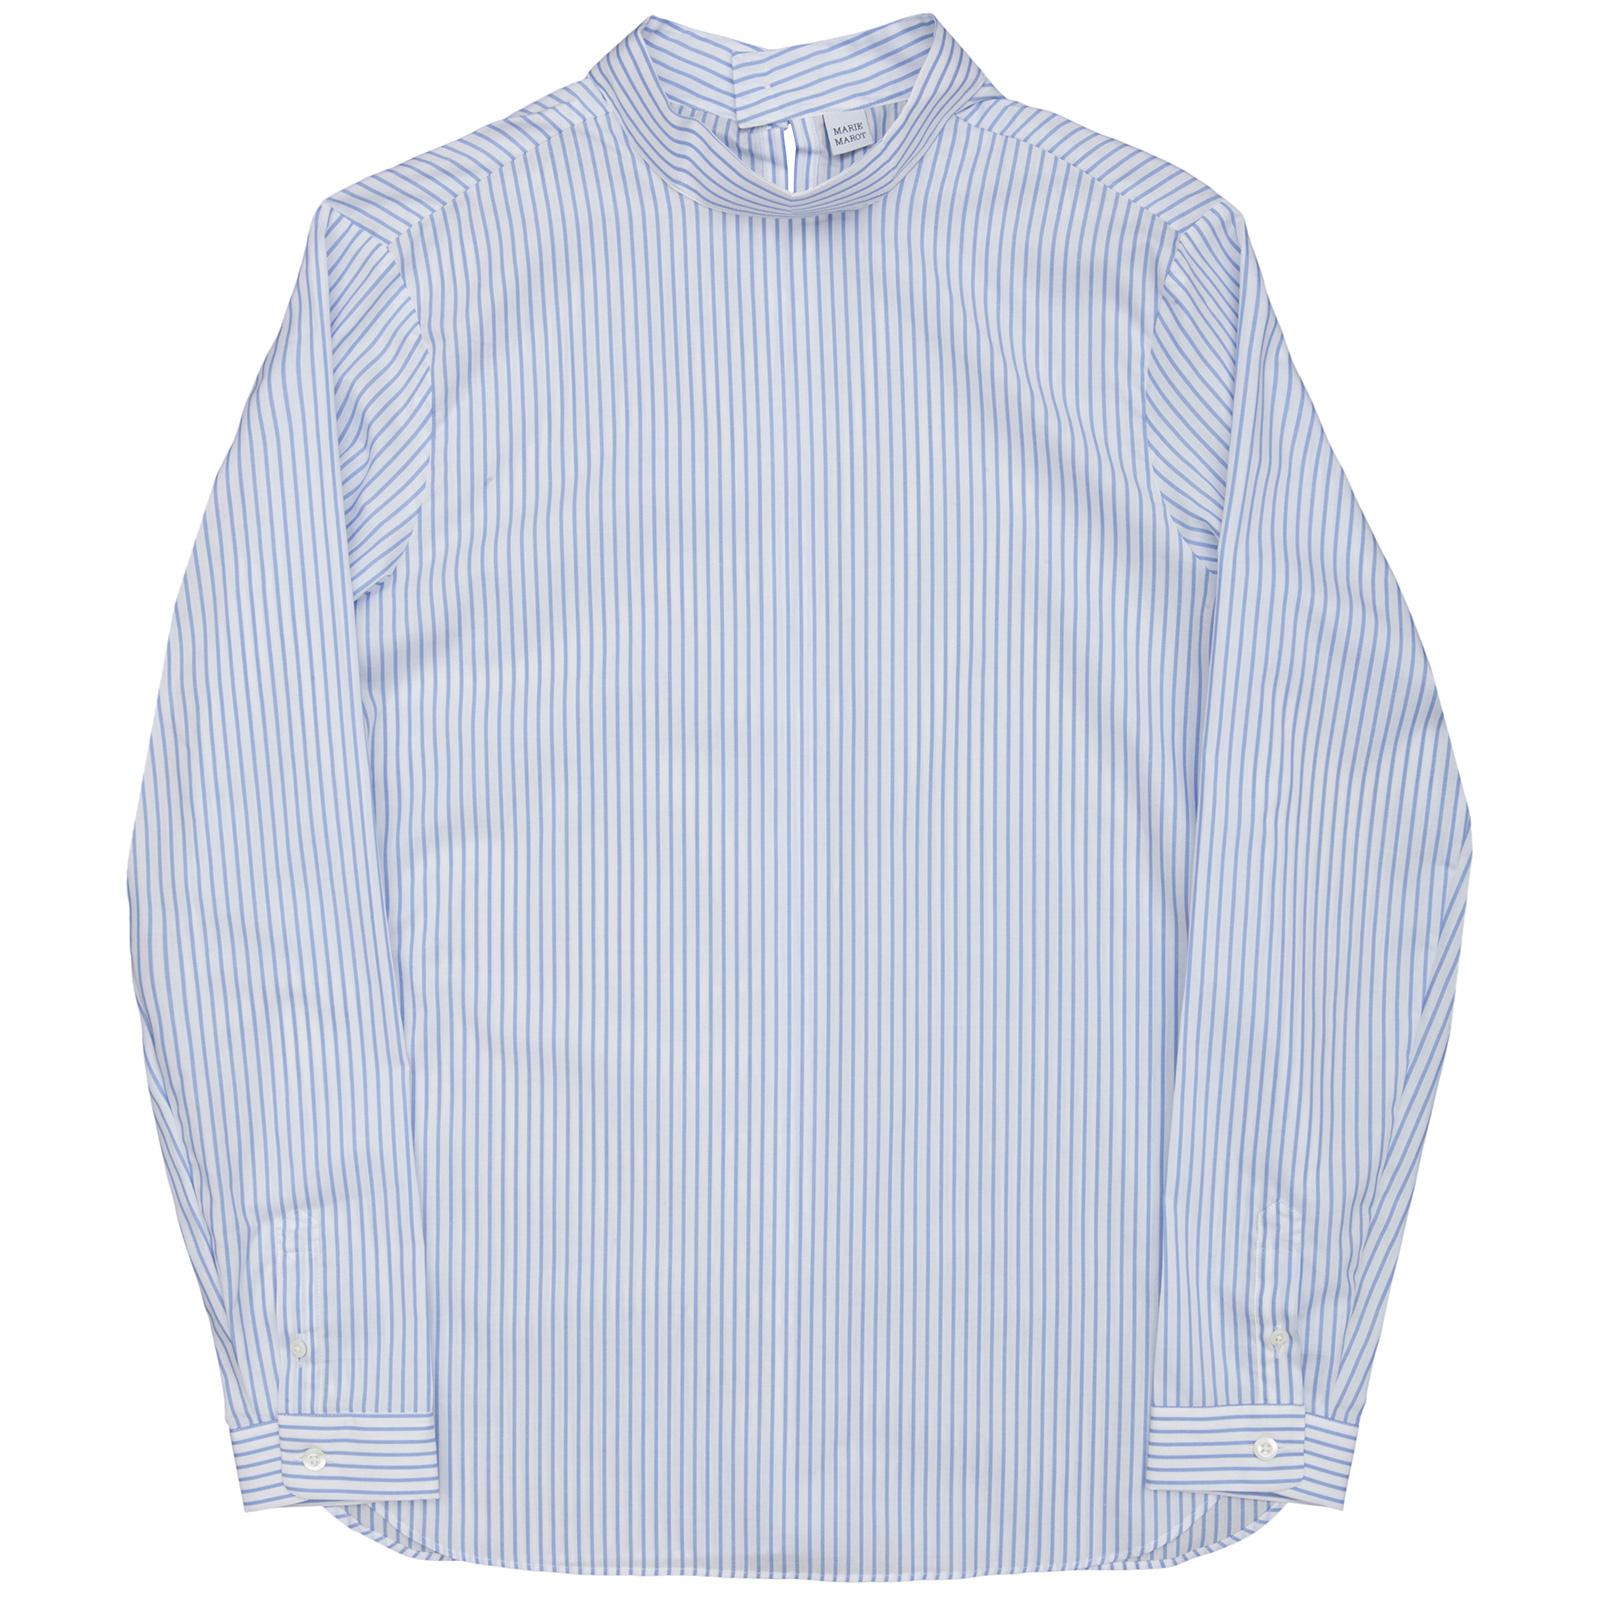 shirt-marie-marot-16_marie-marot_shirts_storm_2